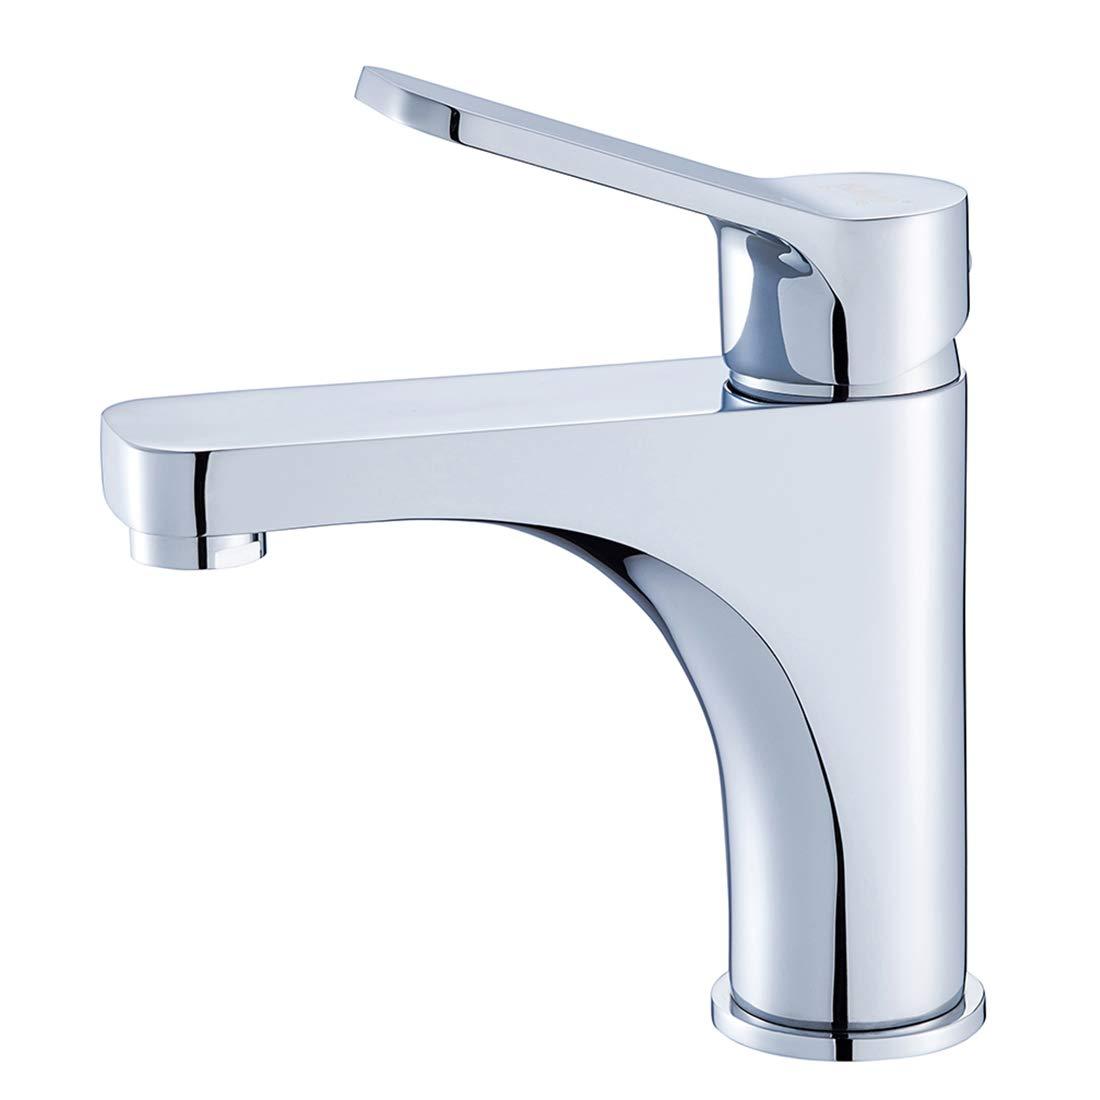 Ballee Mordern Solid Brass Basin Tap Bathroom Sink Mixer Monobloc Chrome Single Lever Single Hole Faucet 8408